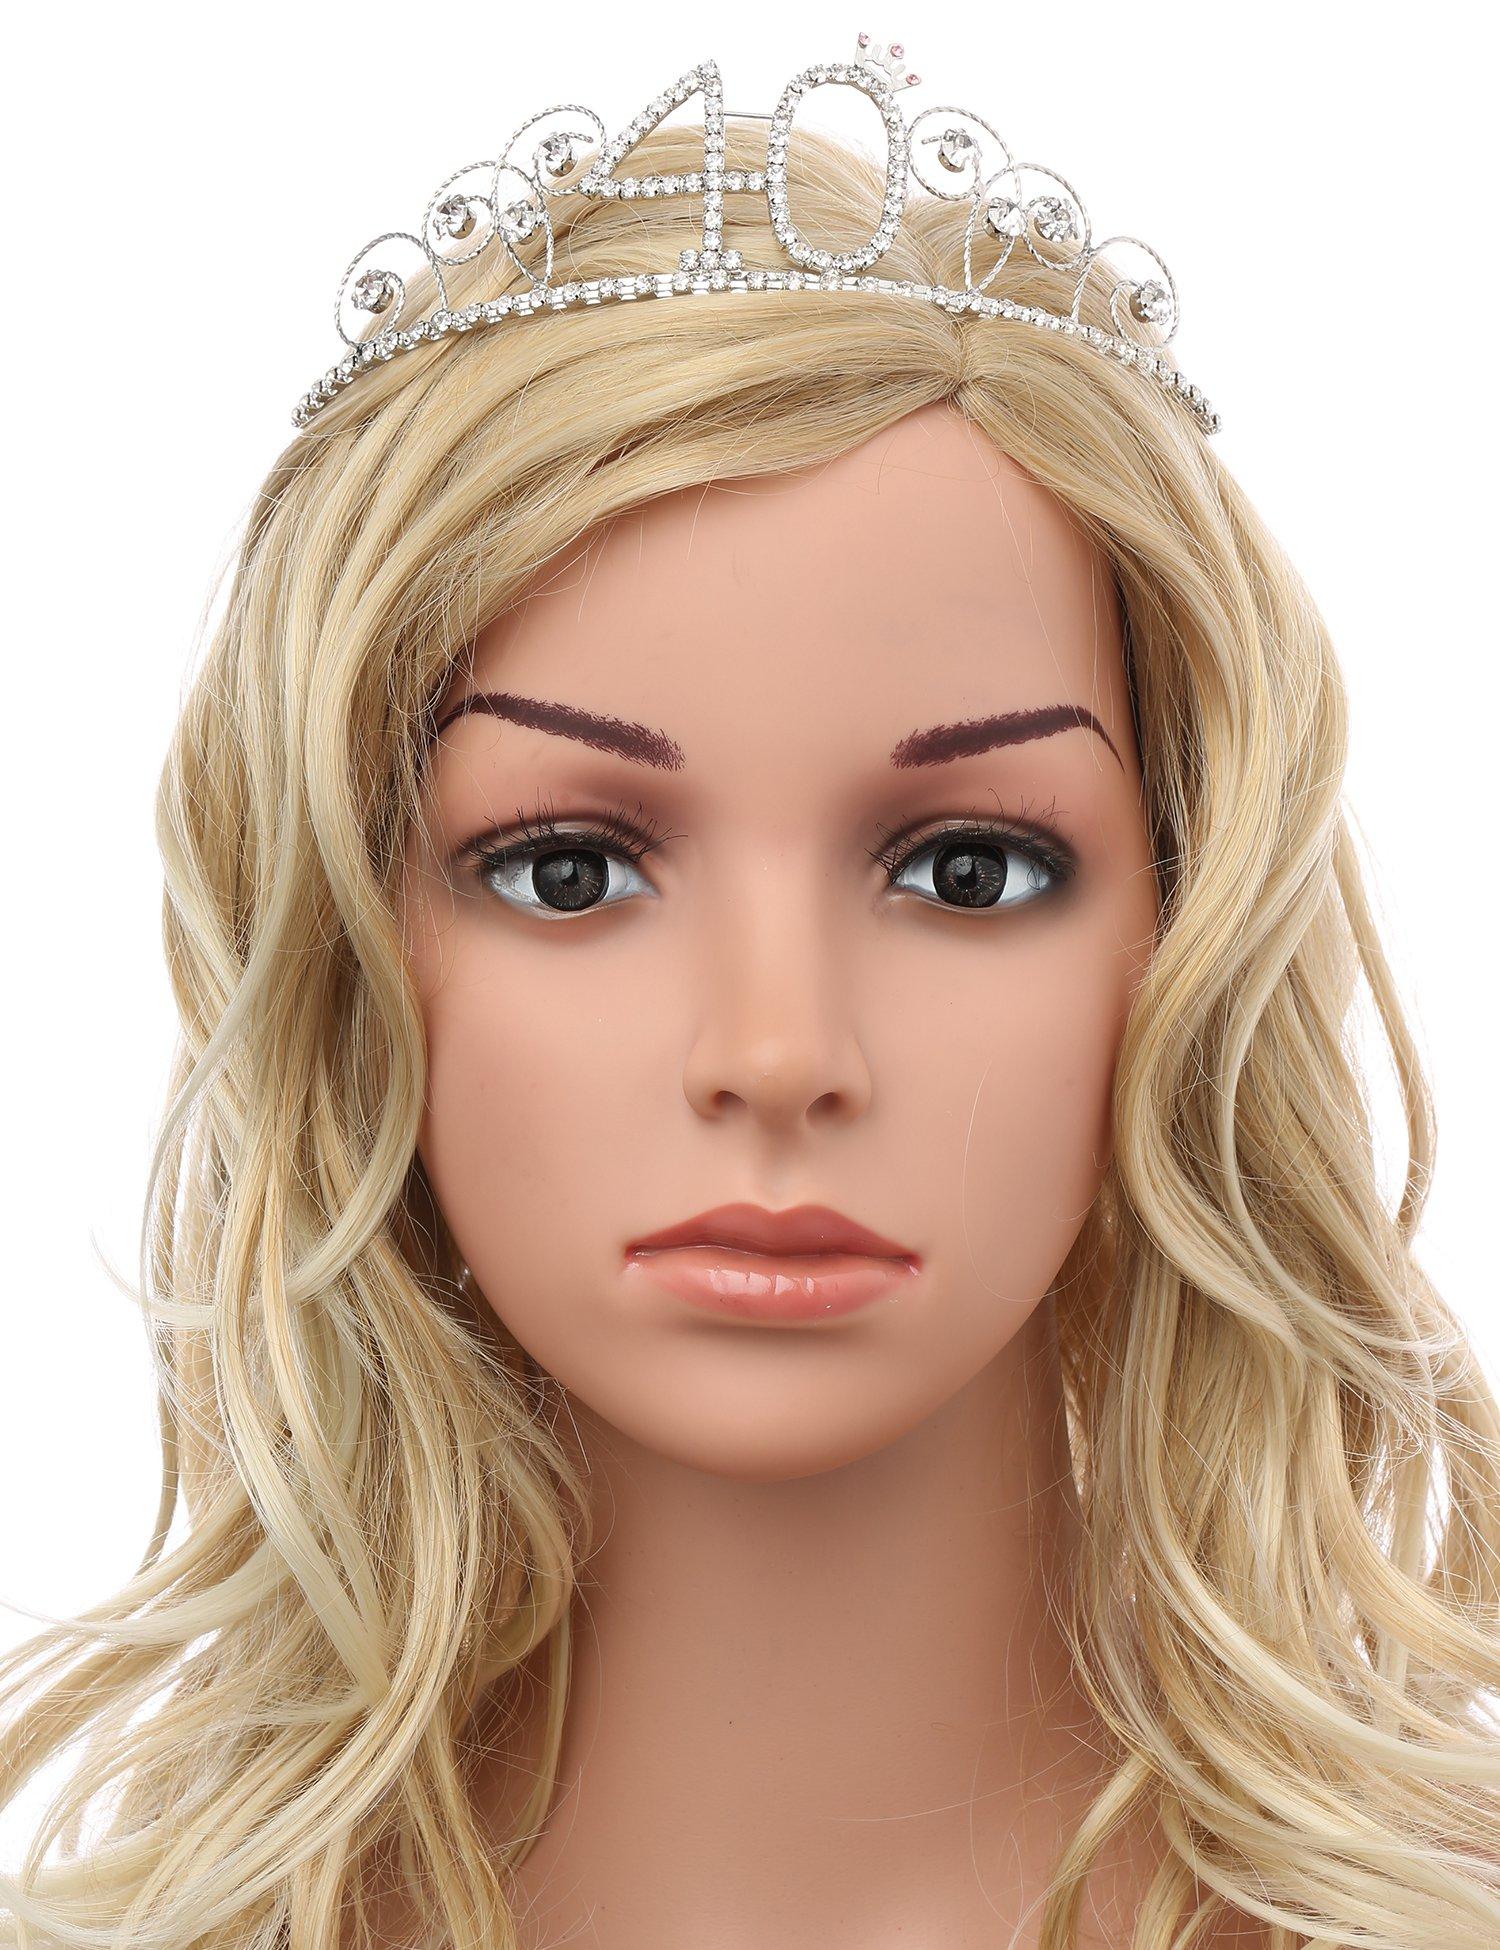 BABEYOND Crystal Tiara Birthday Crown Princess Crown Hair Accessories Silver Diamante Happy 40th Birthday (40 Birth) by BABEYOND (Image #3)